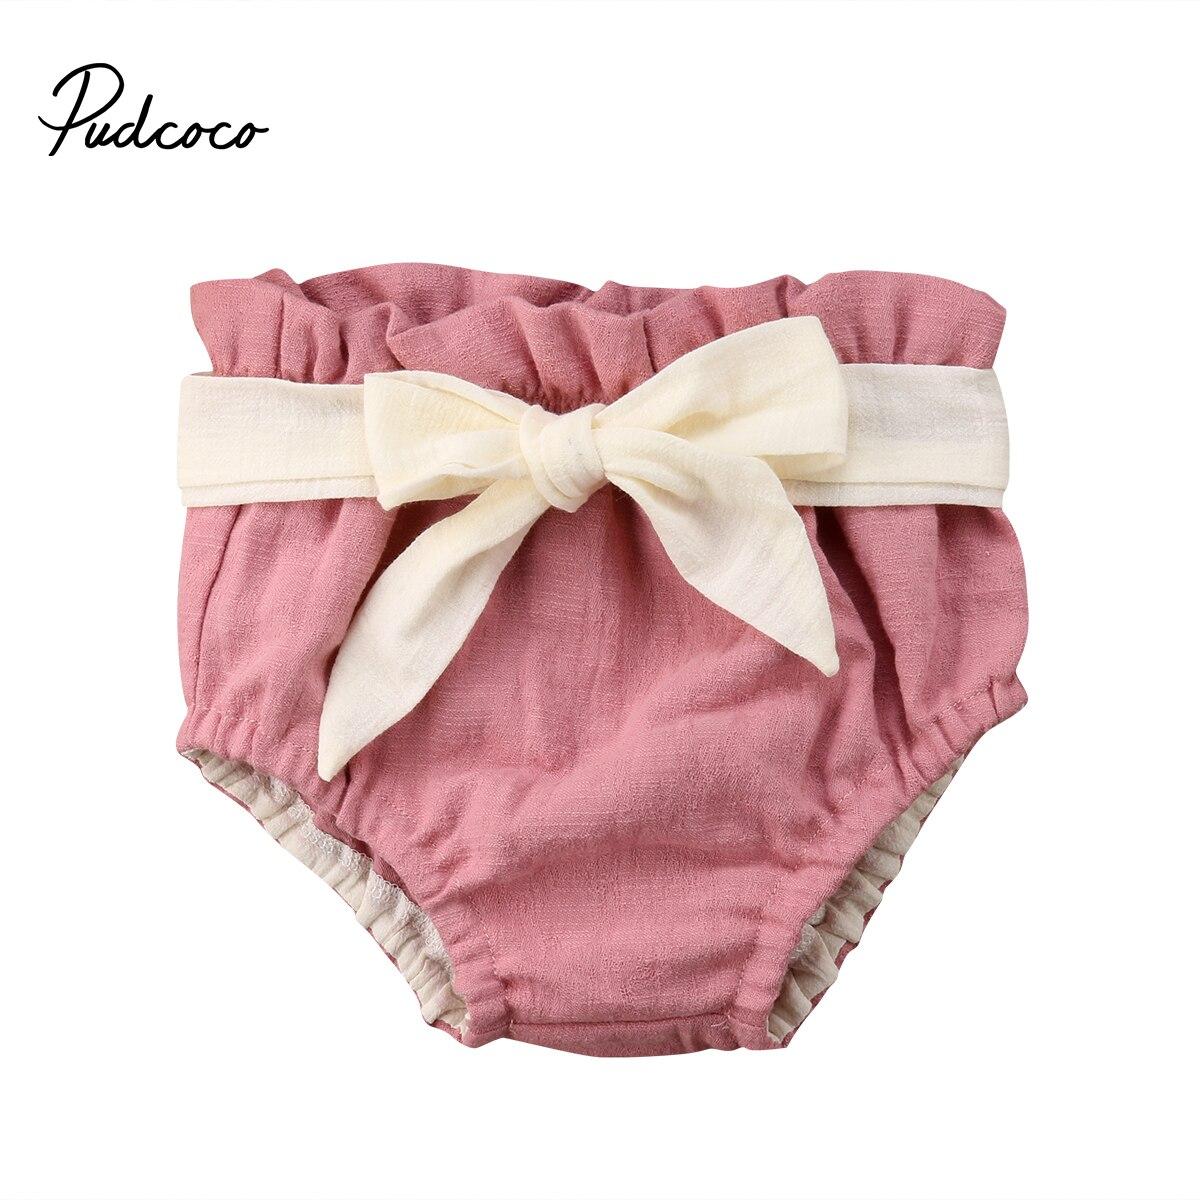 Newborn Infant Baby Girl Boy Kids Cotton Pants Shorts Diaper Nappy Cover Bottoms